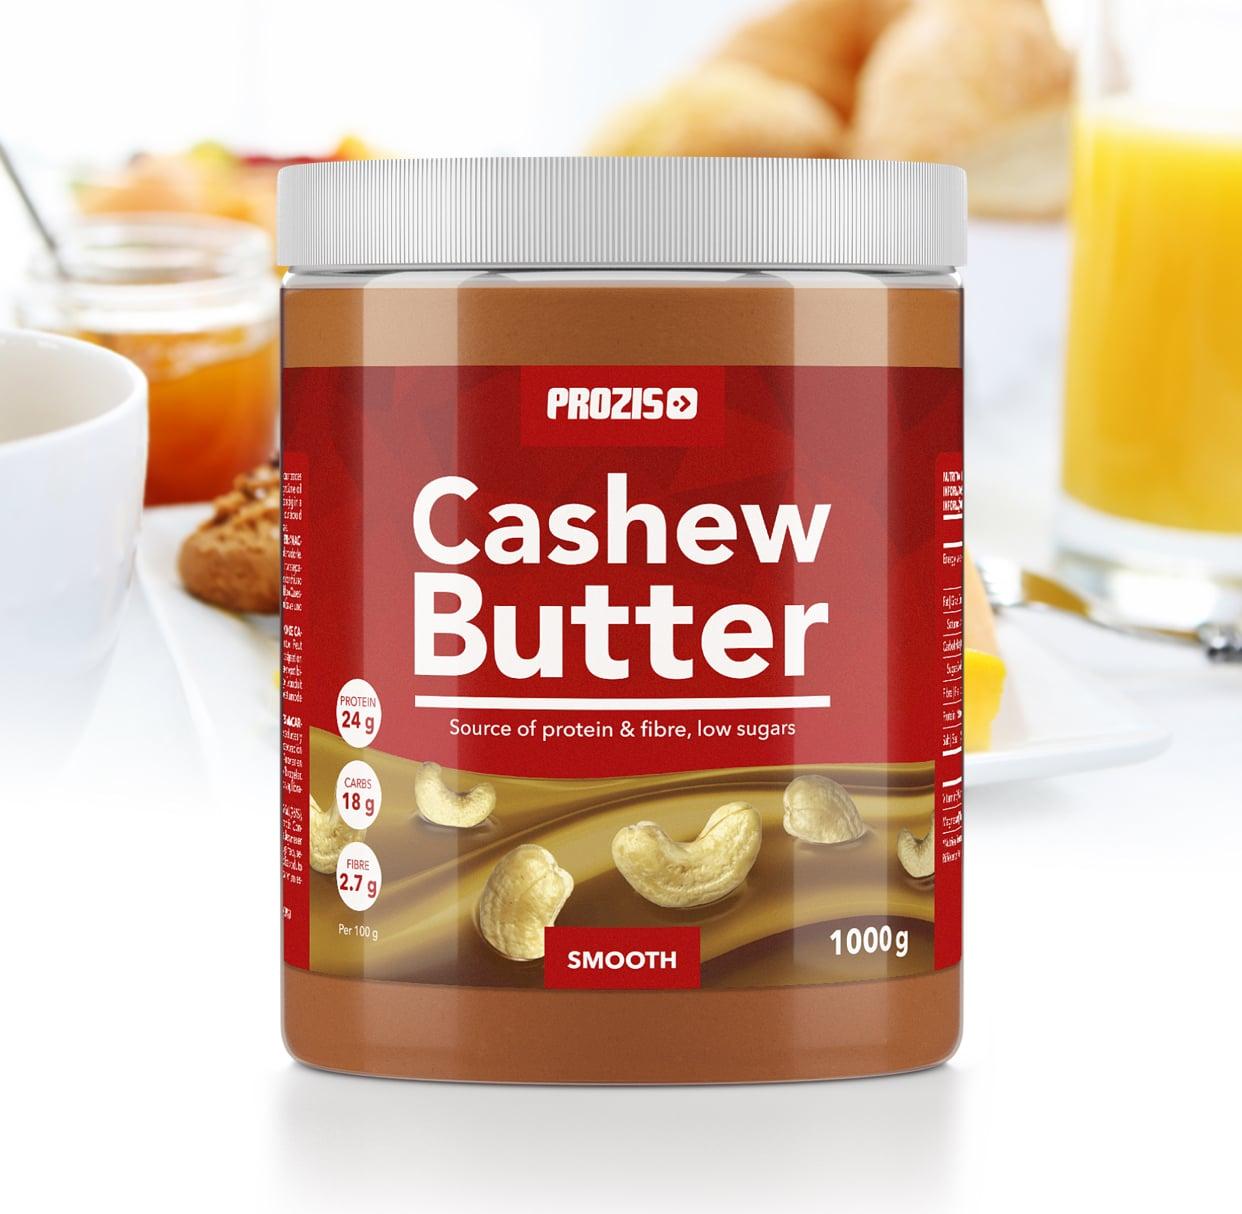 Prozis Cashew Butter